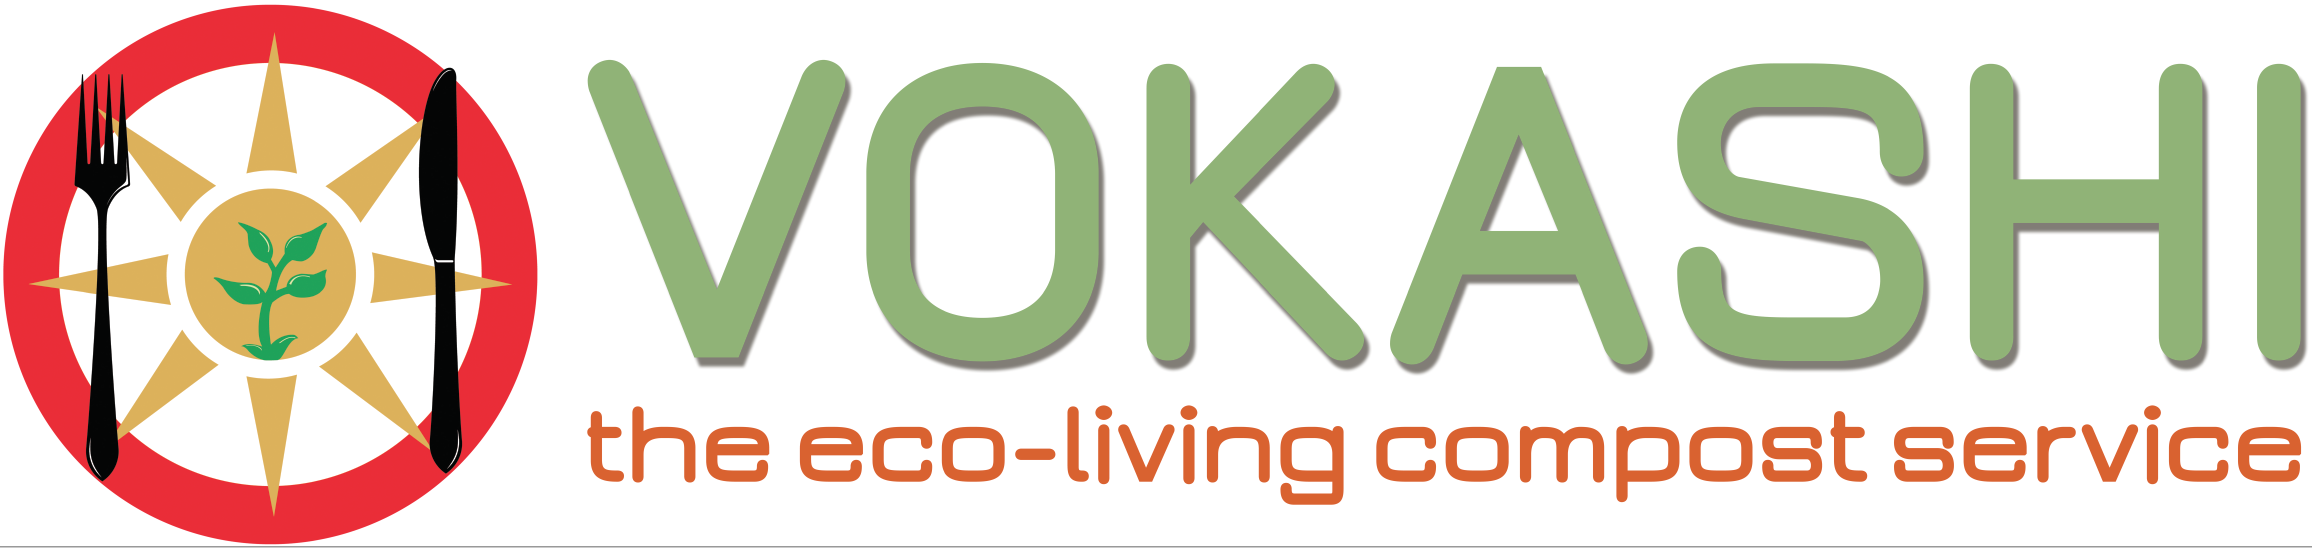 vokashi-logo.png